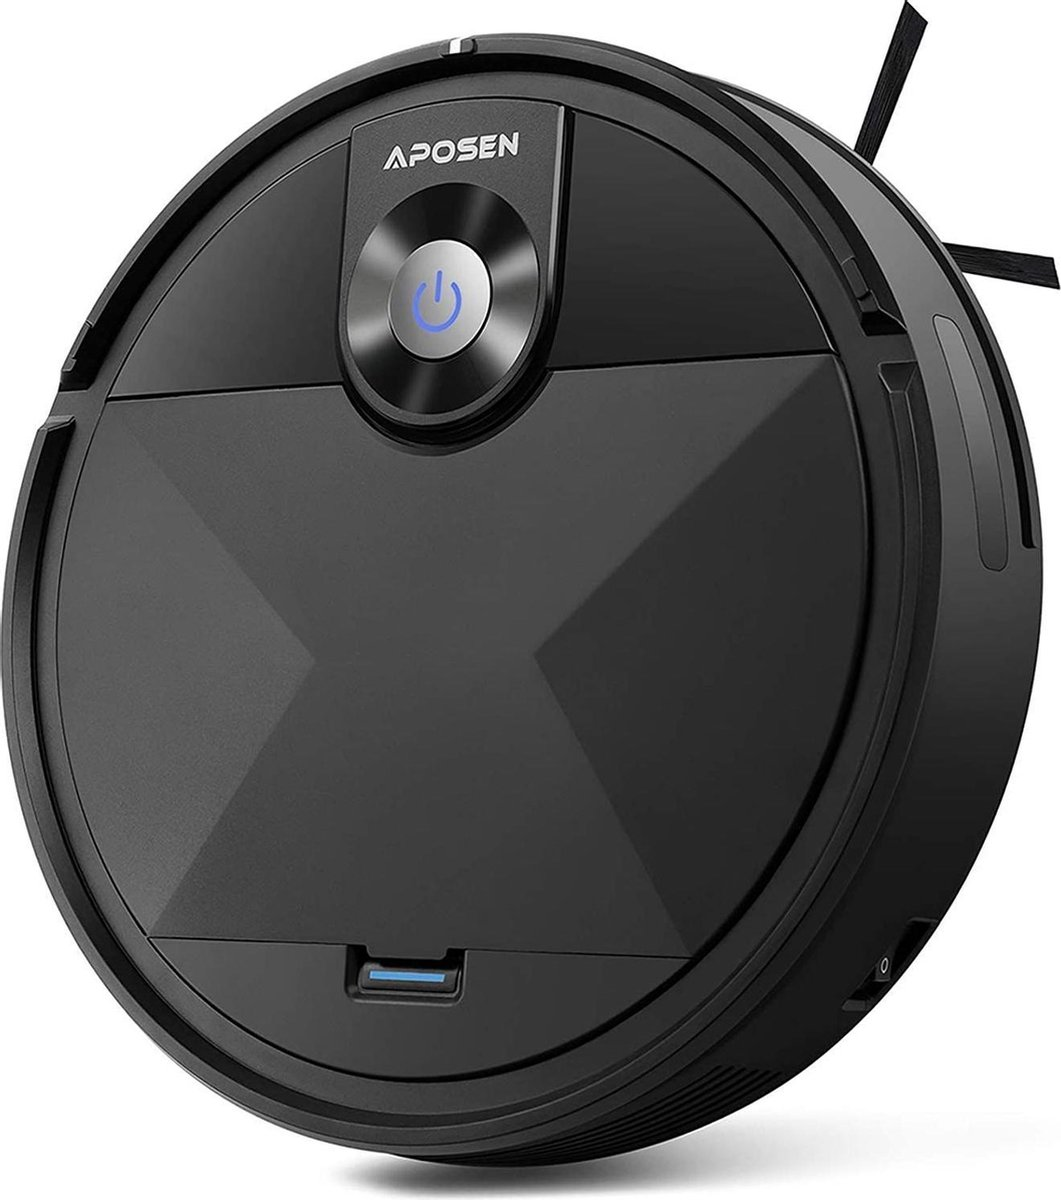 Aposen - Robotstofzuiger - A200 - Stofzuiger - Robotzuiger